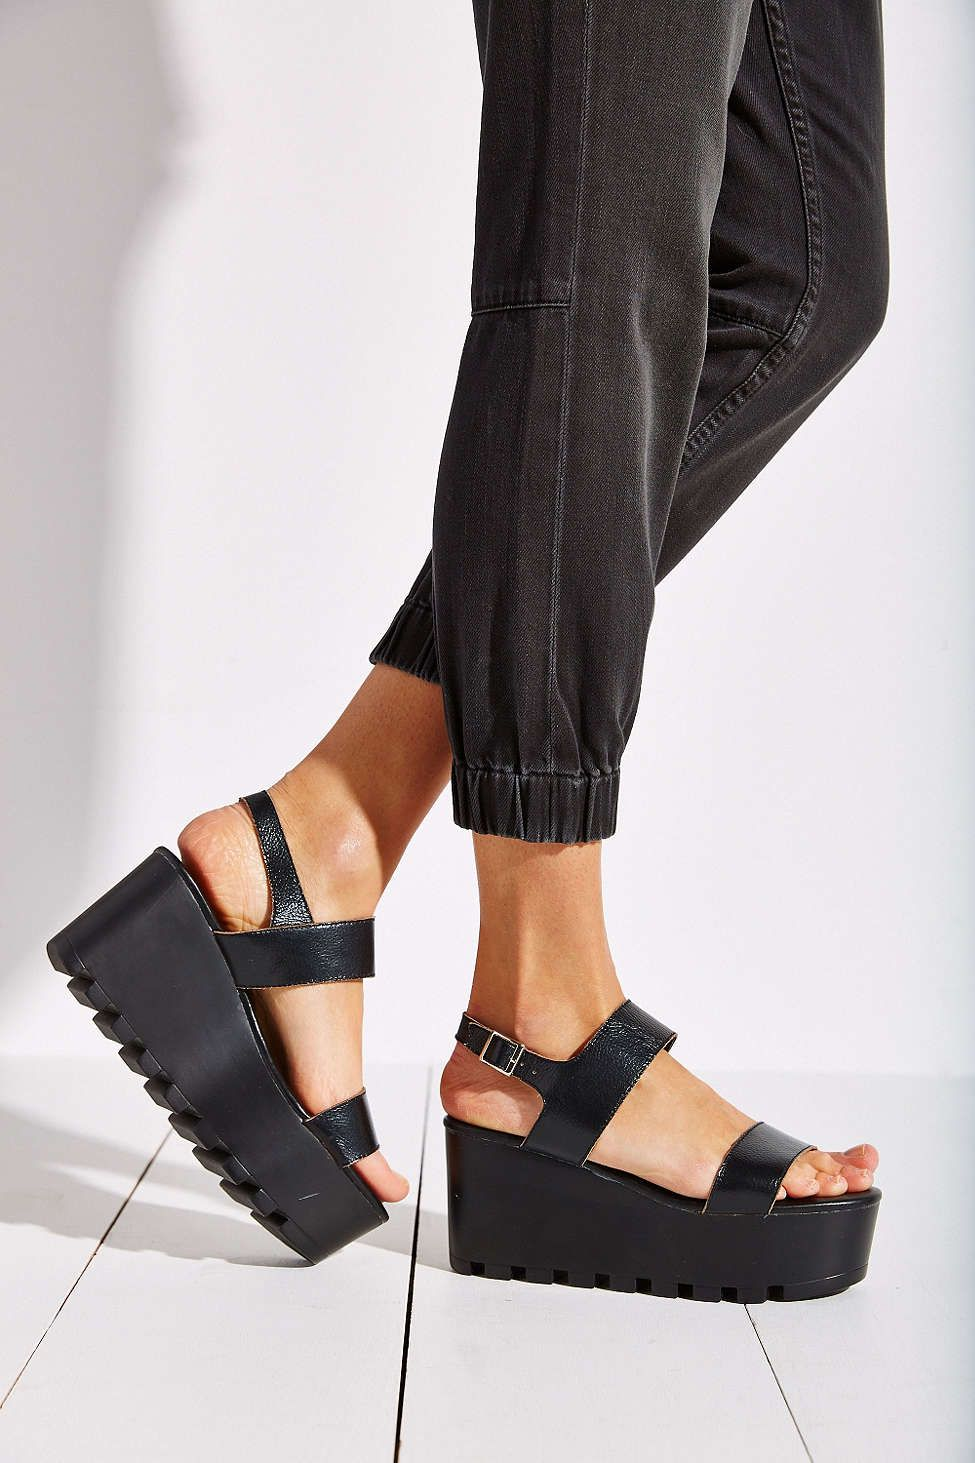 Black sandals grunge - Sixtyseven Amber Platform Sandal